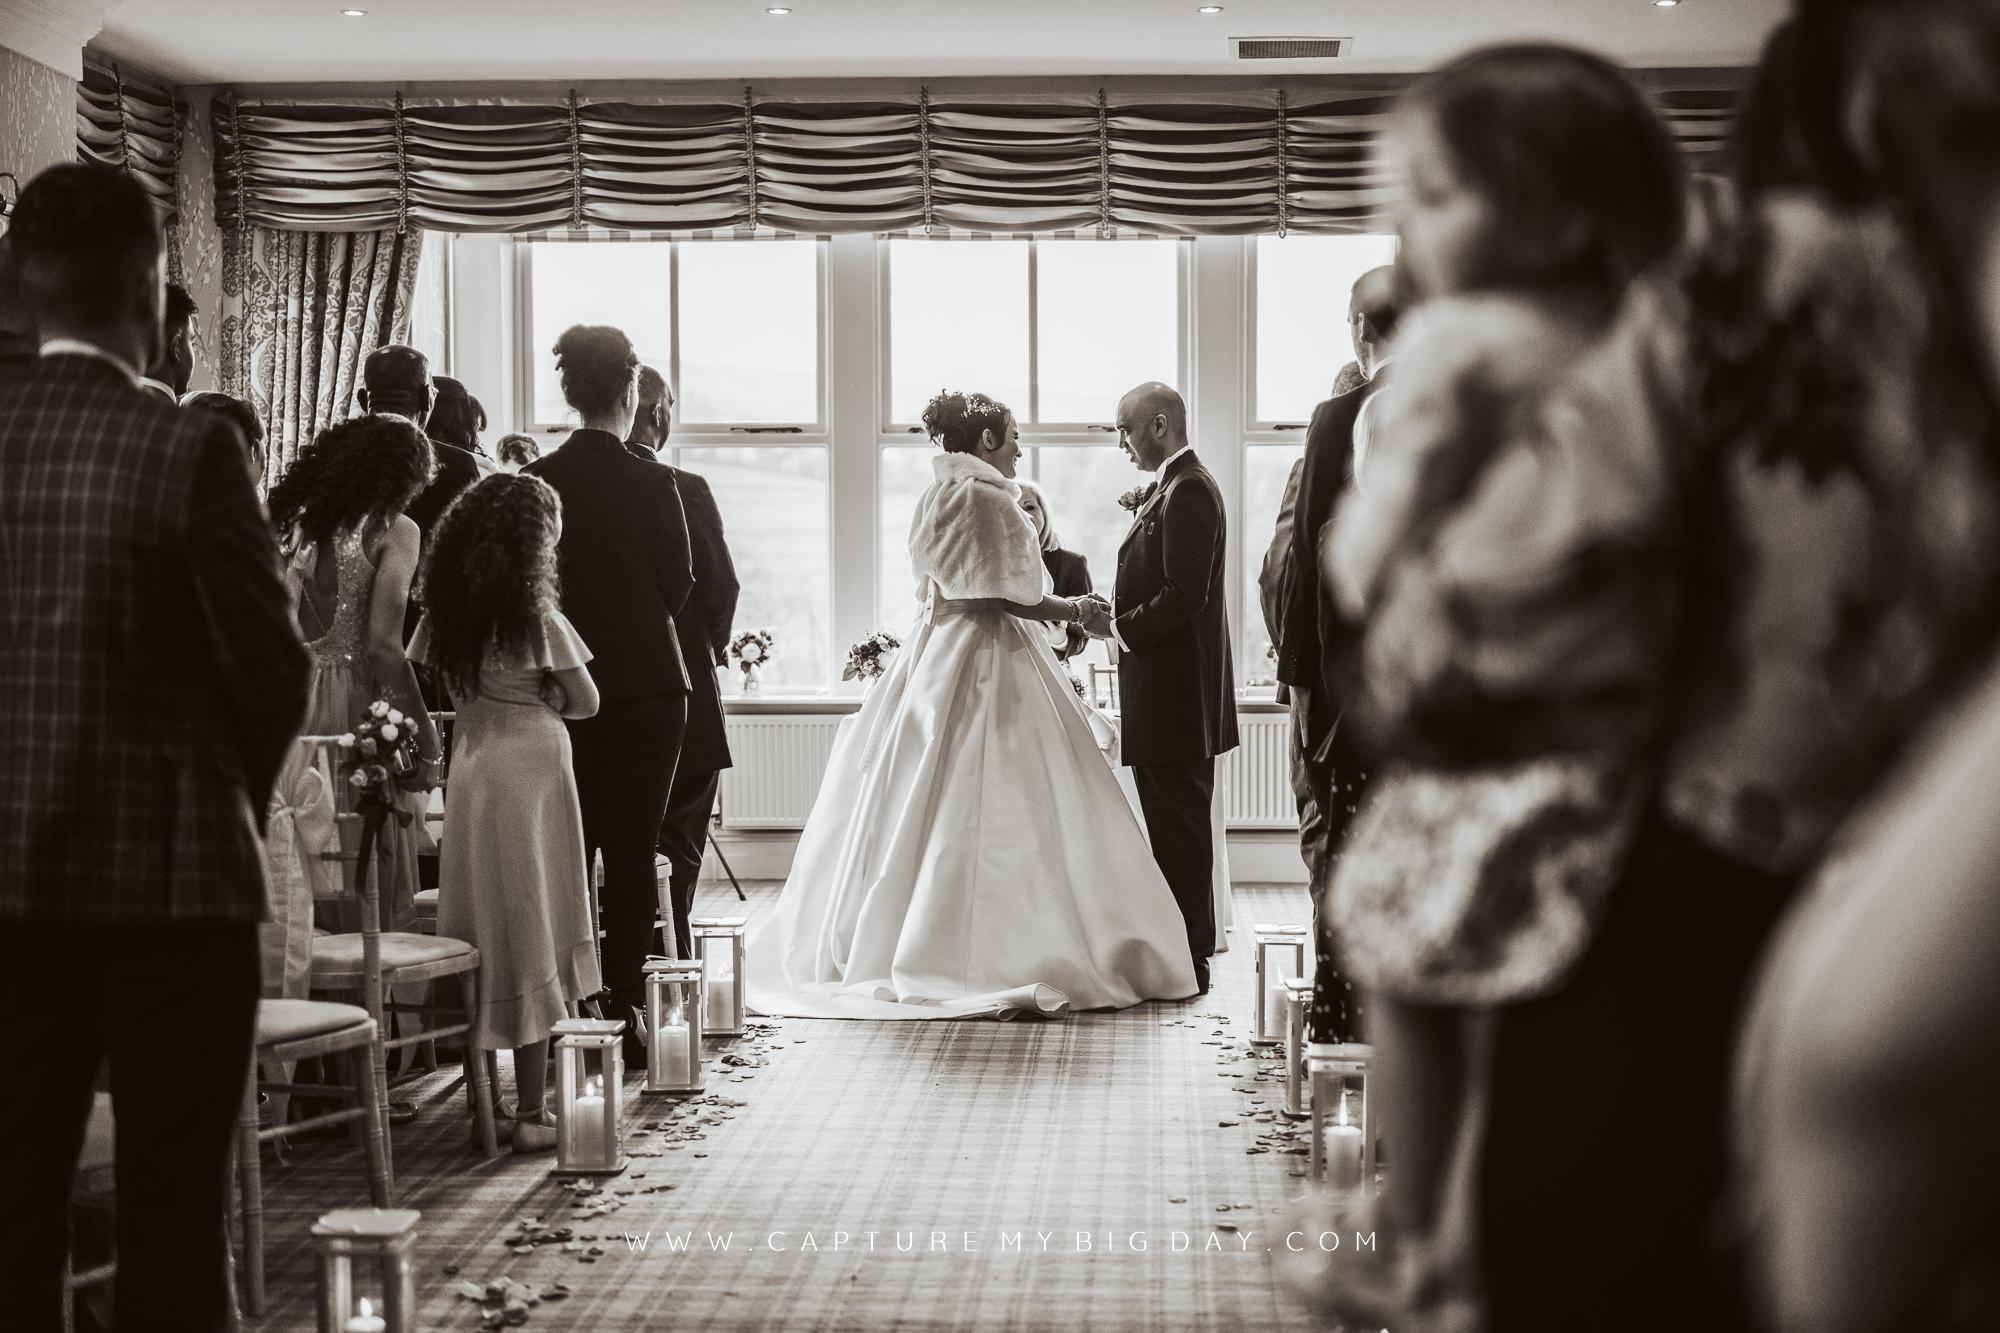 bride and groom in wedding ceremony